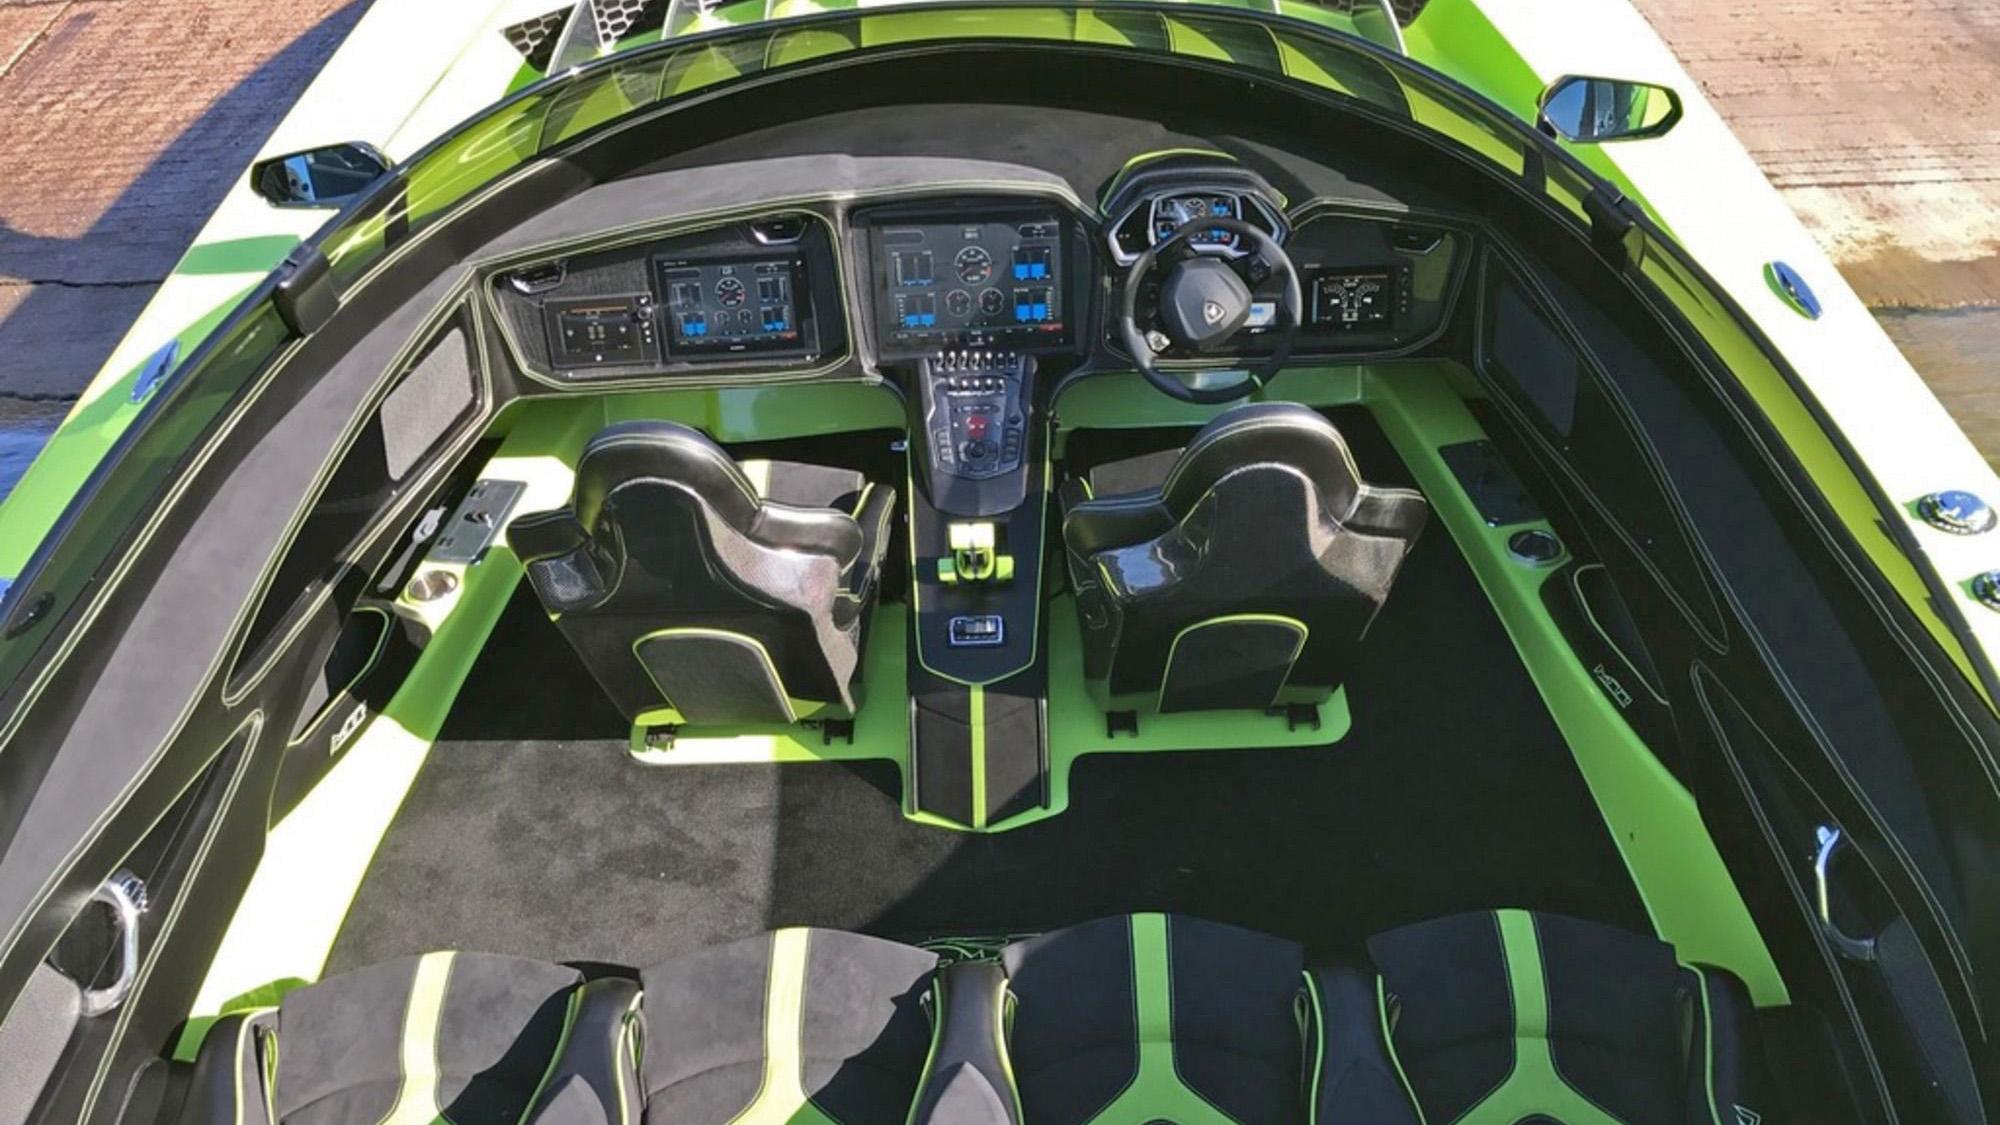 Lamborghini Aventador Roadster >> You can buy a Lamborghini Aventador speed boat | Top Gear